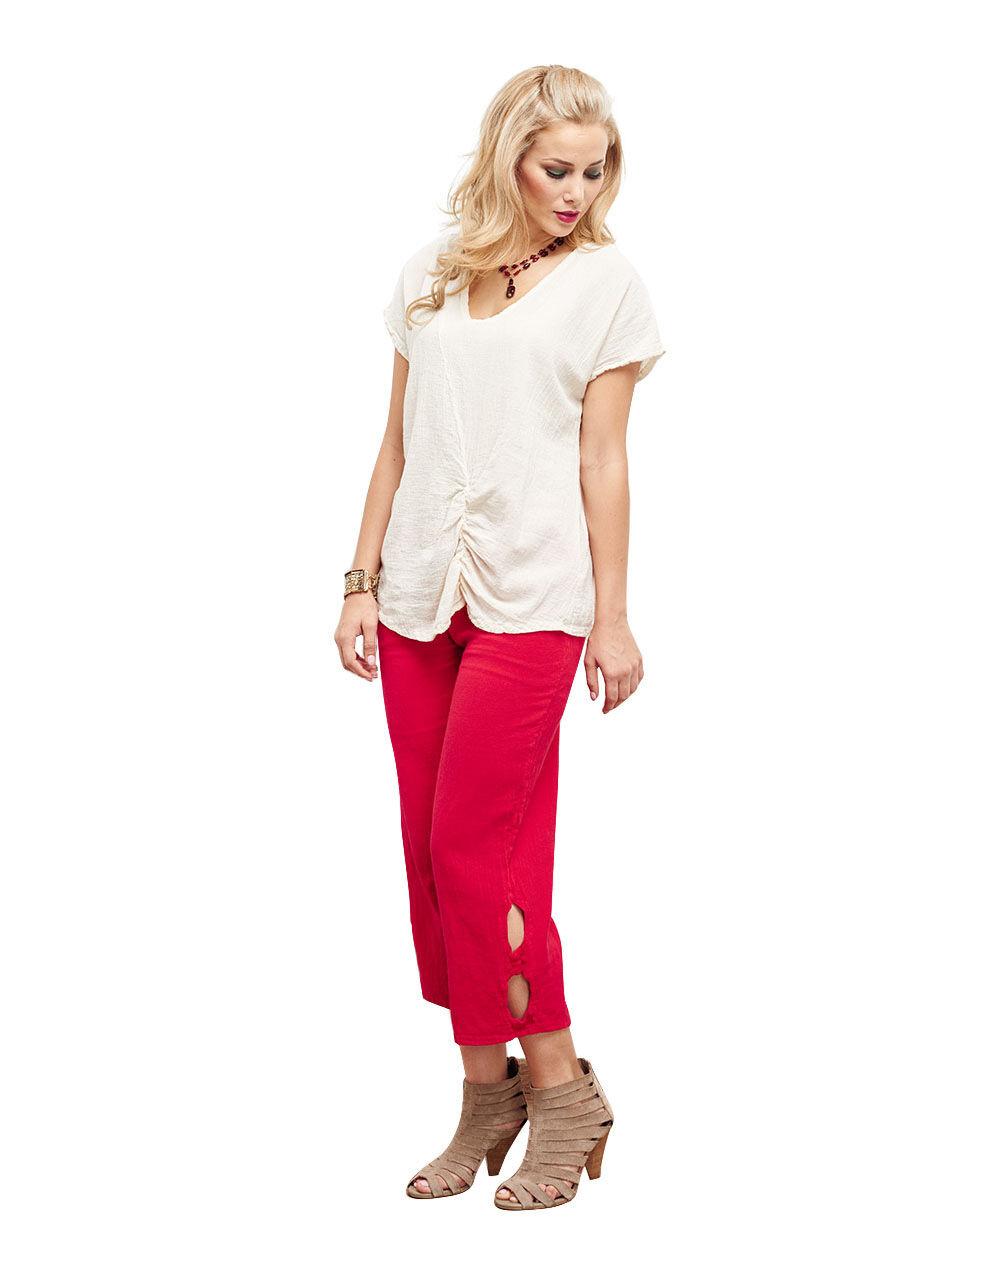 Oh My Gauze Cloud Pant 100% Comfortable Cotton Lagenlook Kurz Length